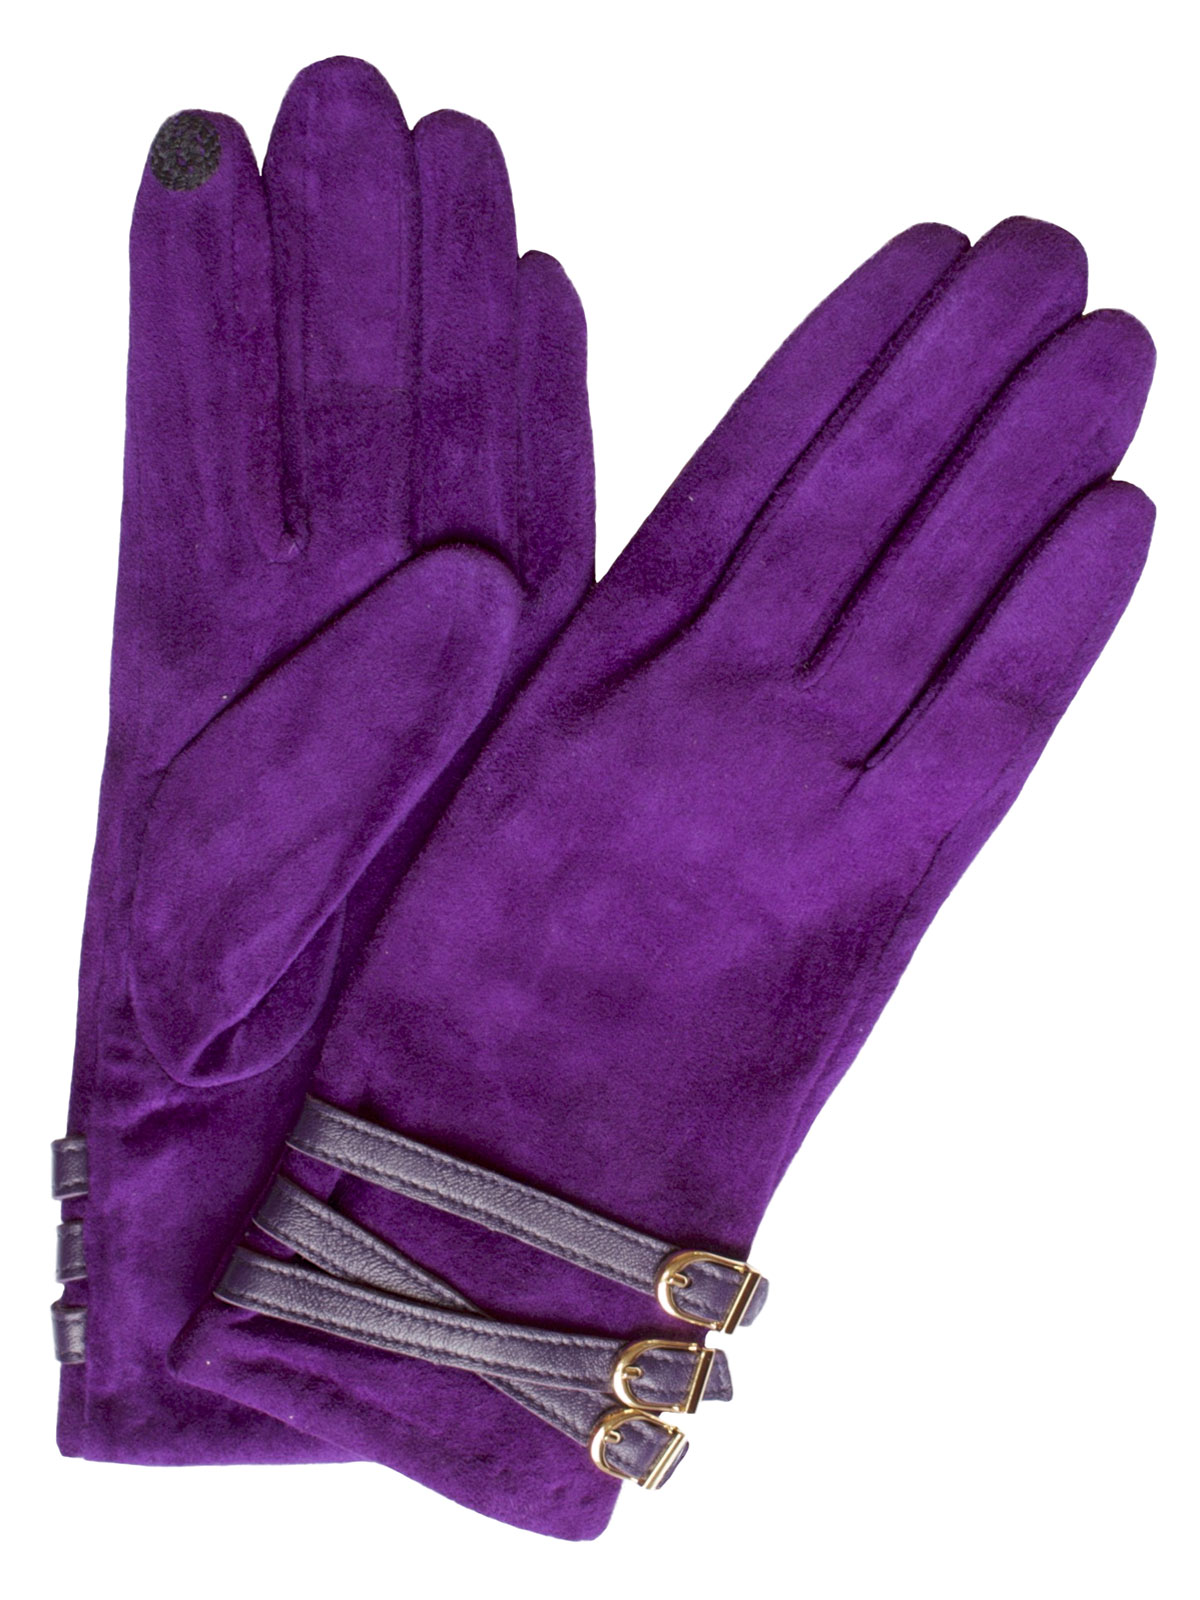 Dents Women's Suede Touchscreen Gloves, 3 buckle strap, amethyst